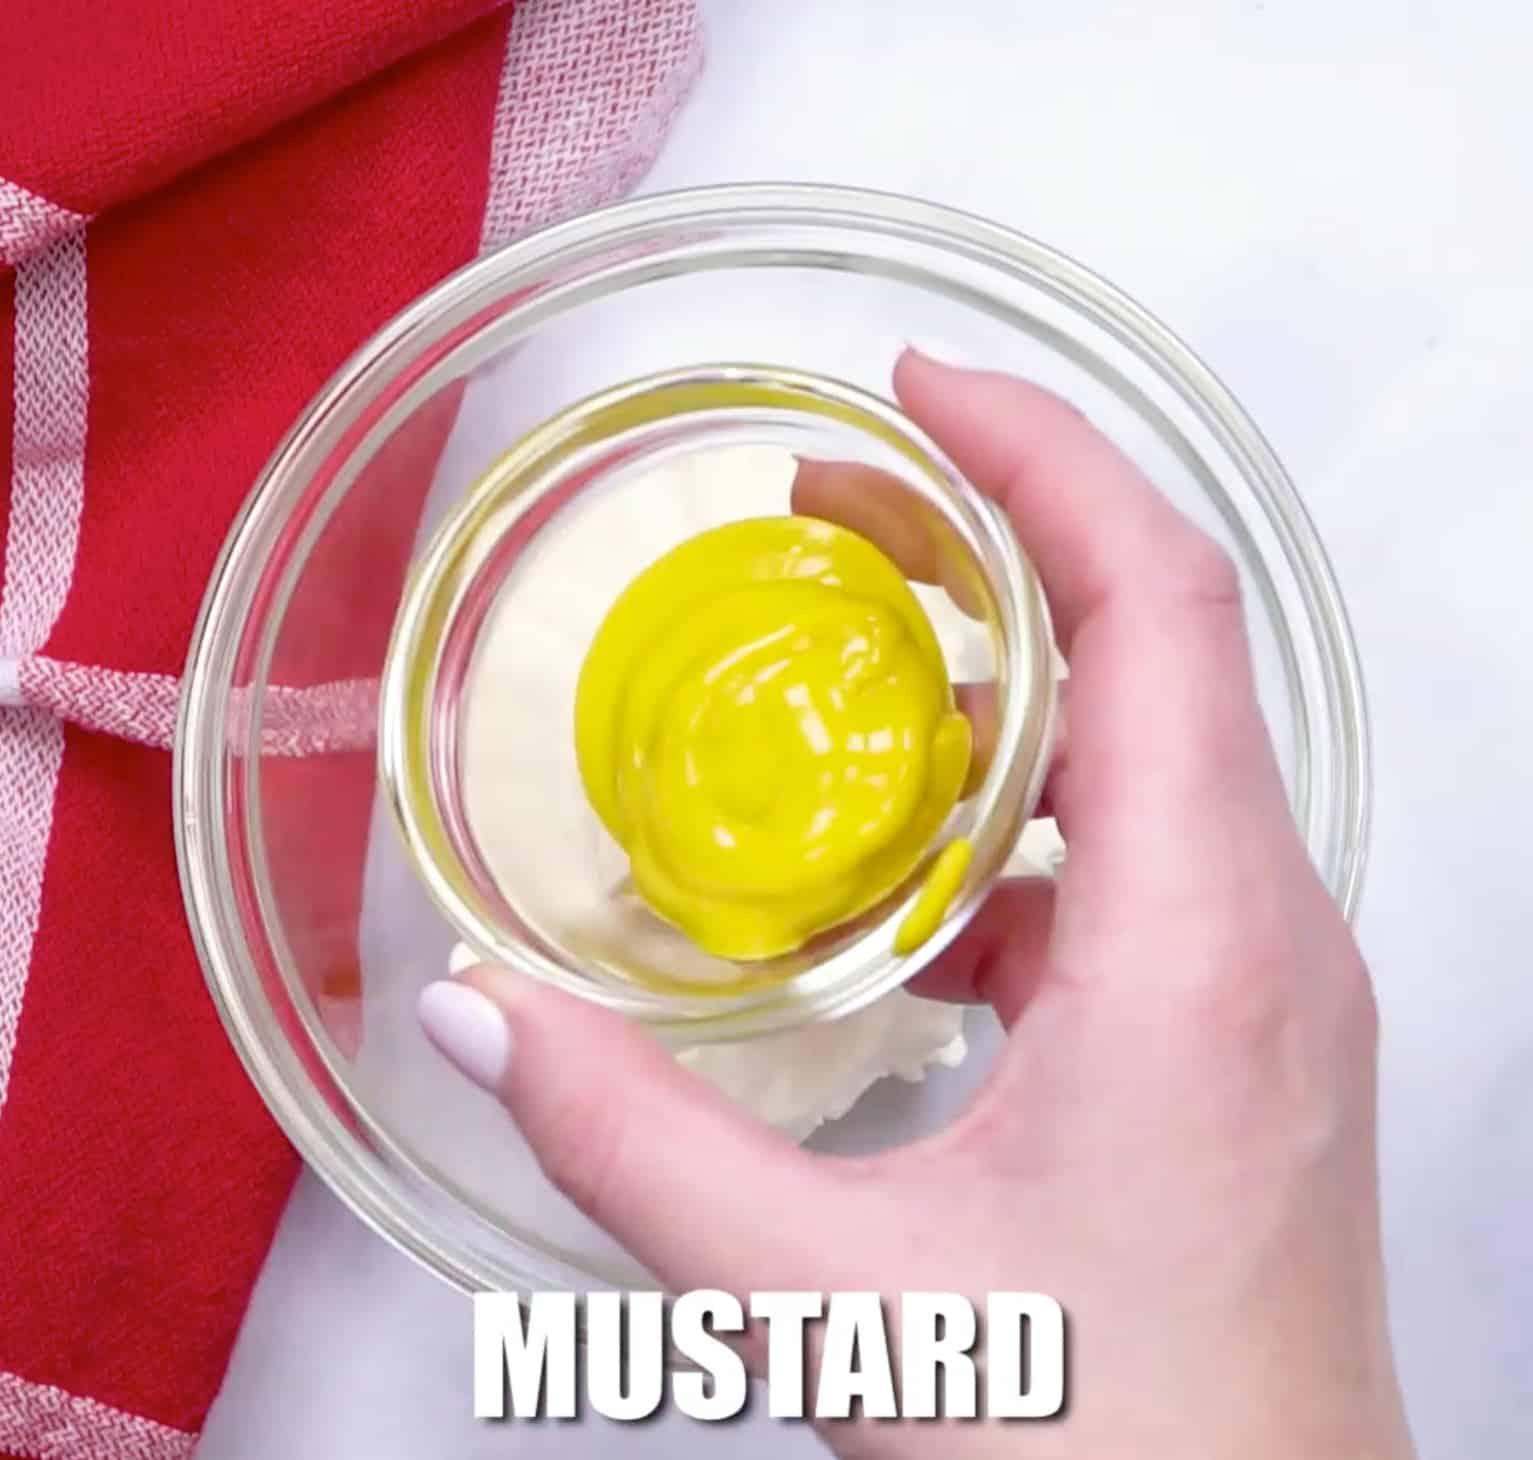 chick fil a sauce mustard